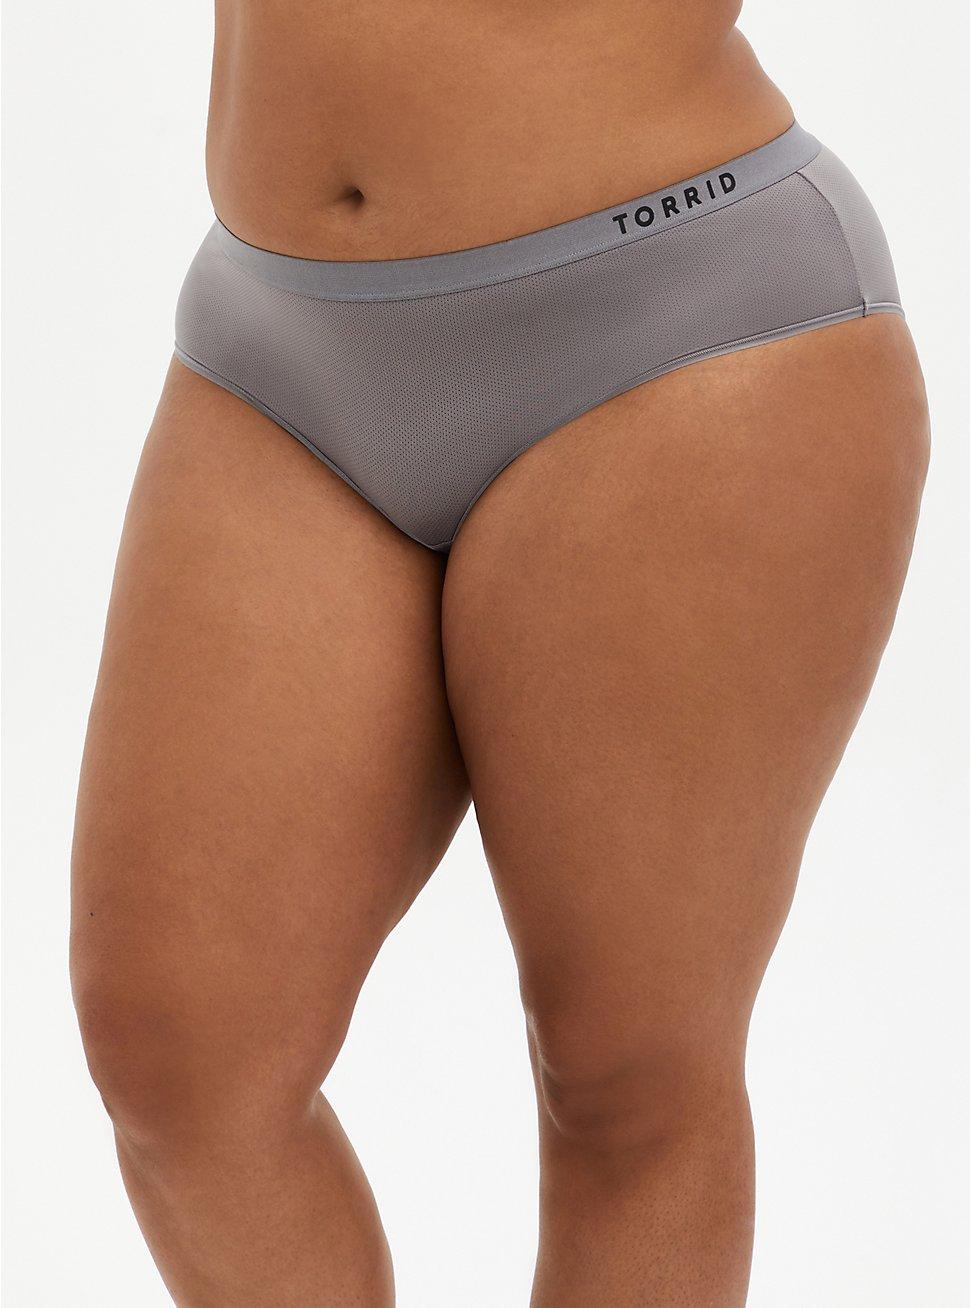 Torrid Logo Grey Microfiber Active Hipster Panty, SILVER FILAGREE, hi-res